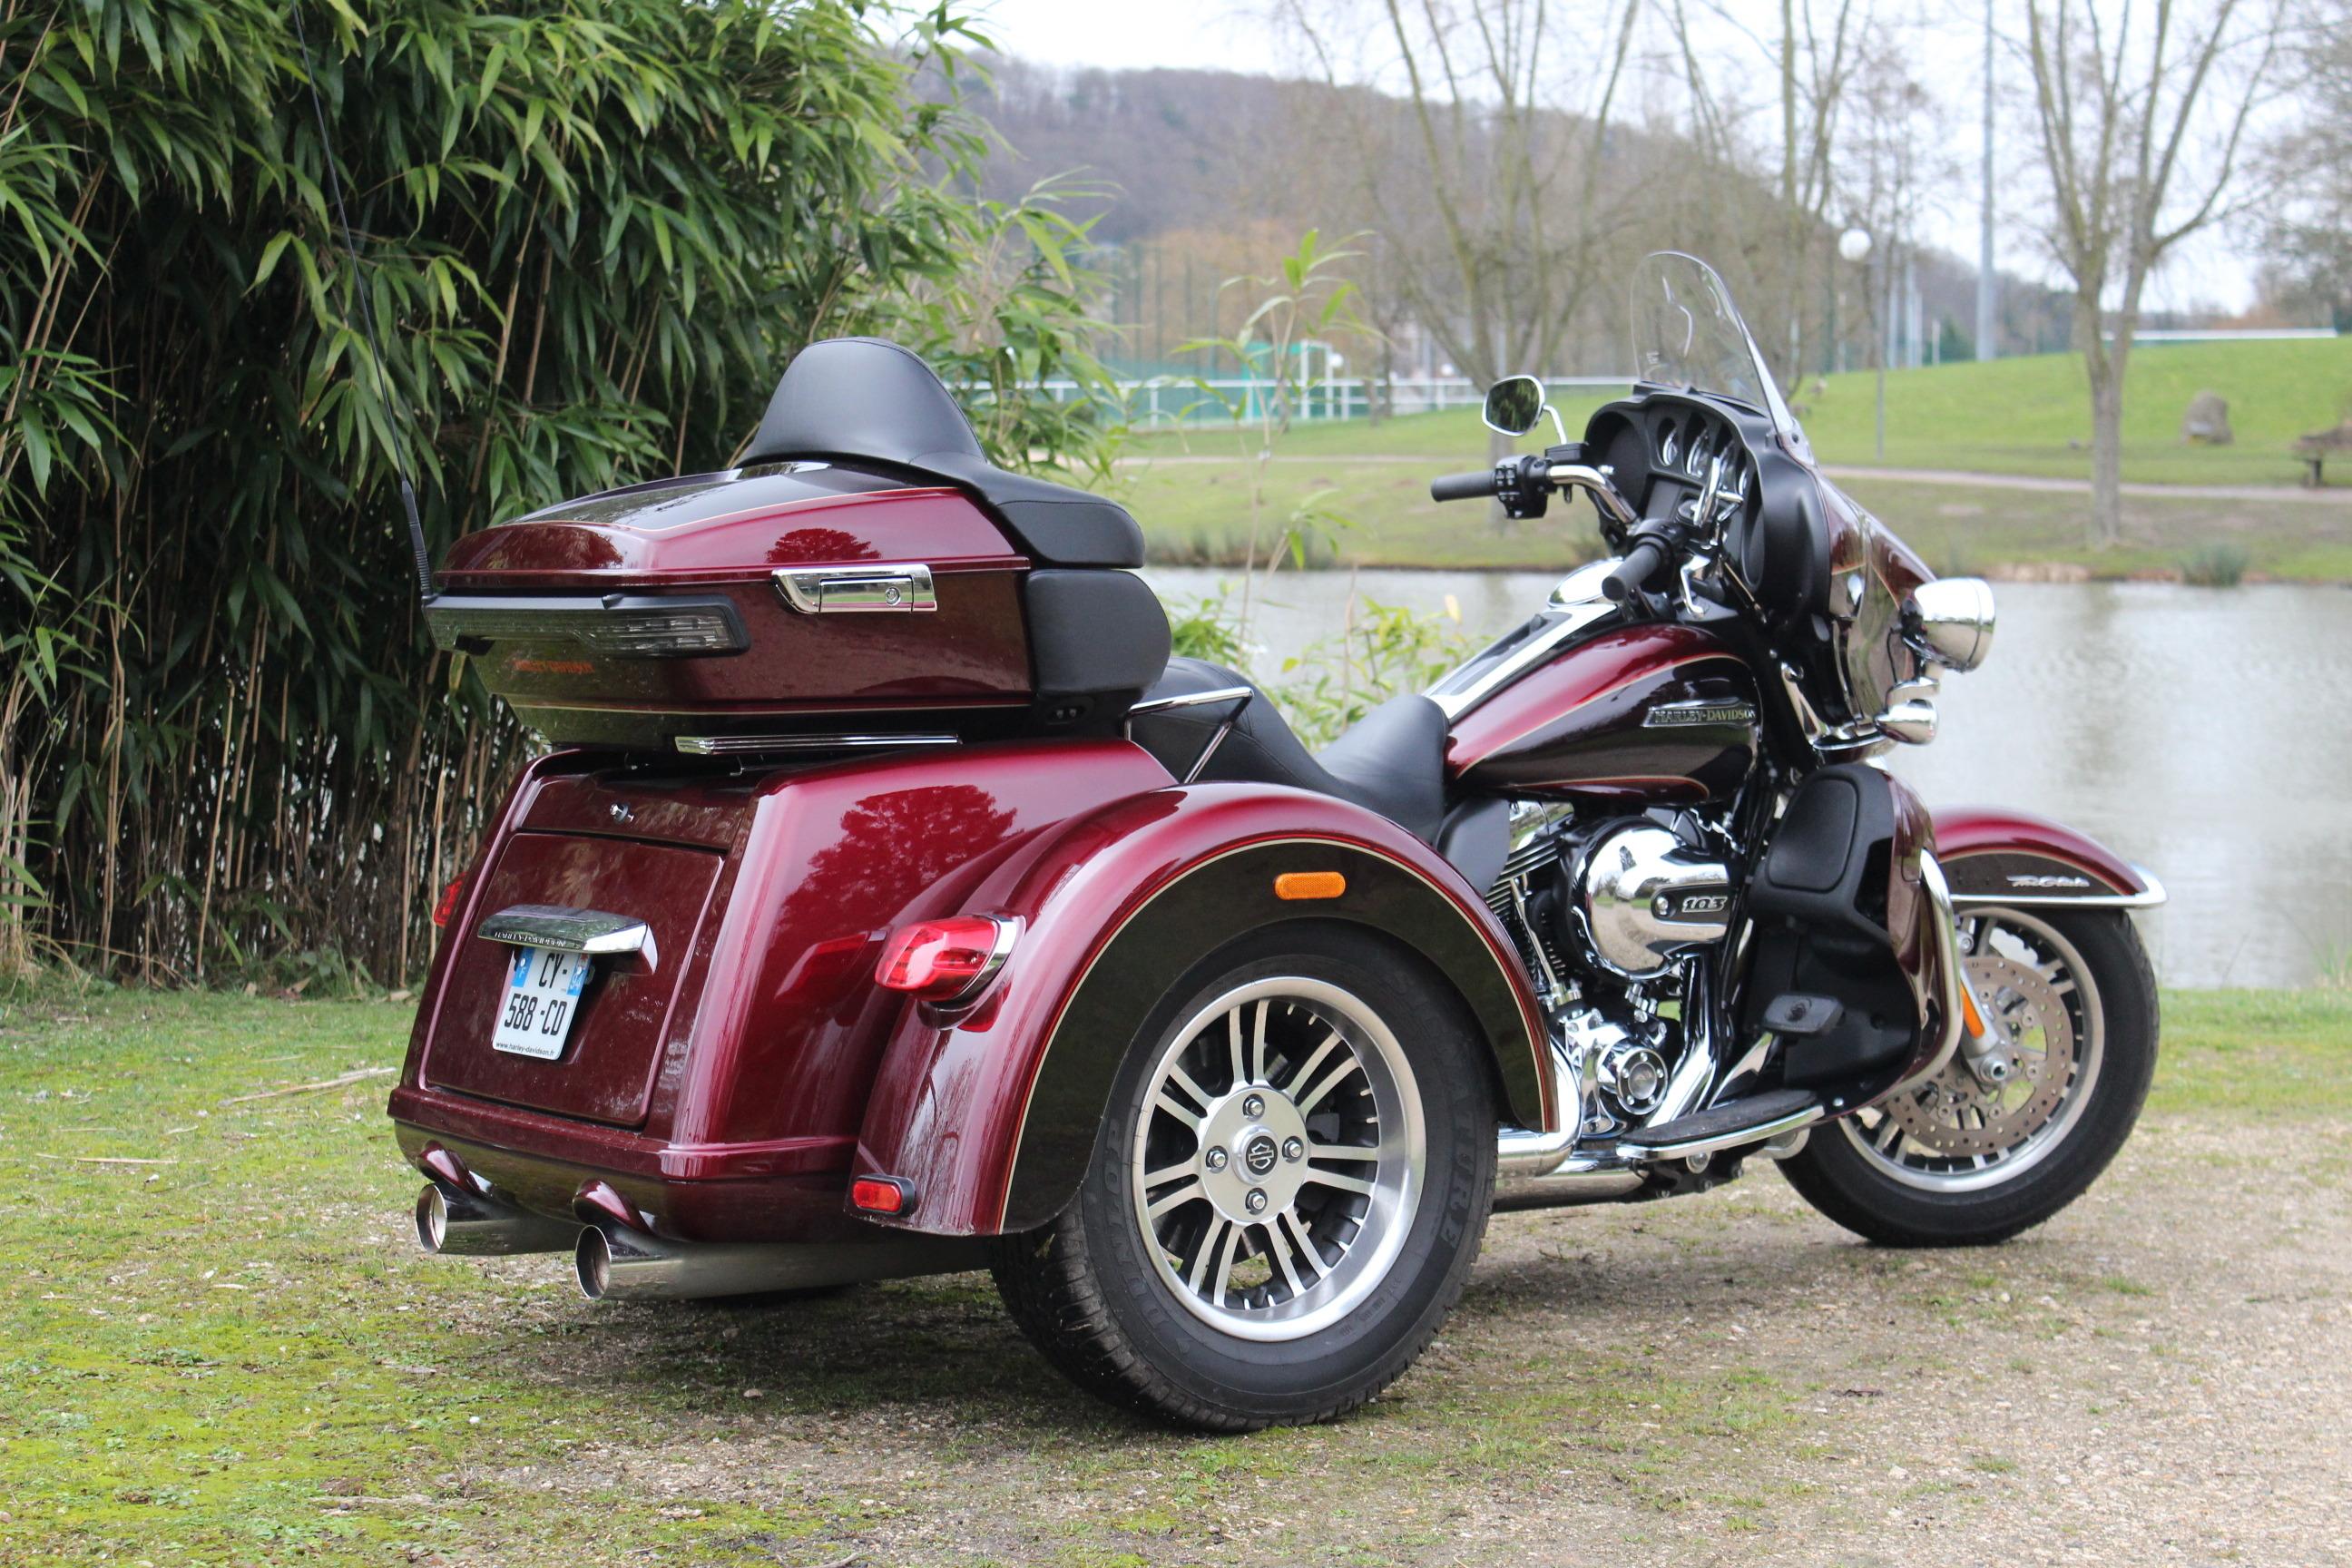 Essai Vid 233 O Harley Davidson Triglide Quand Harley Rime